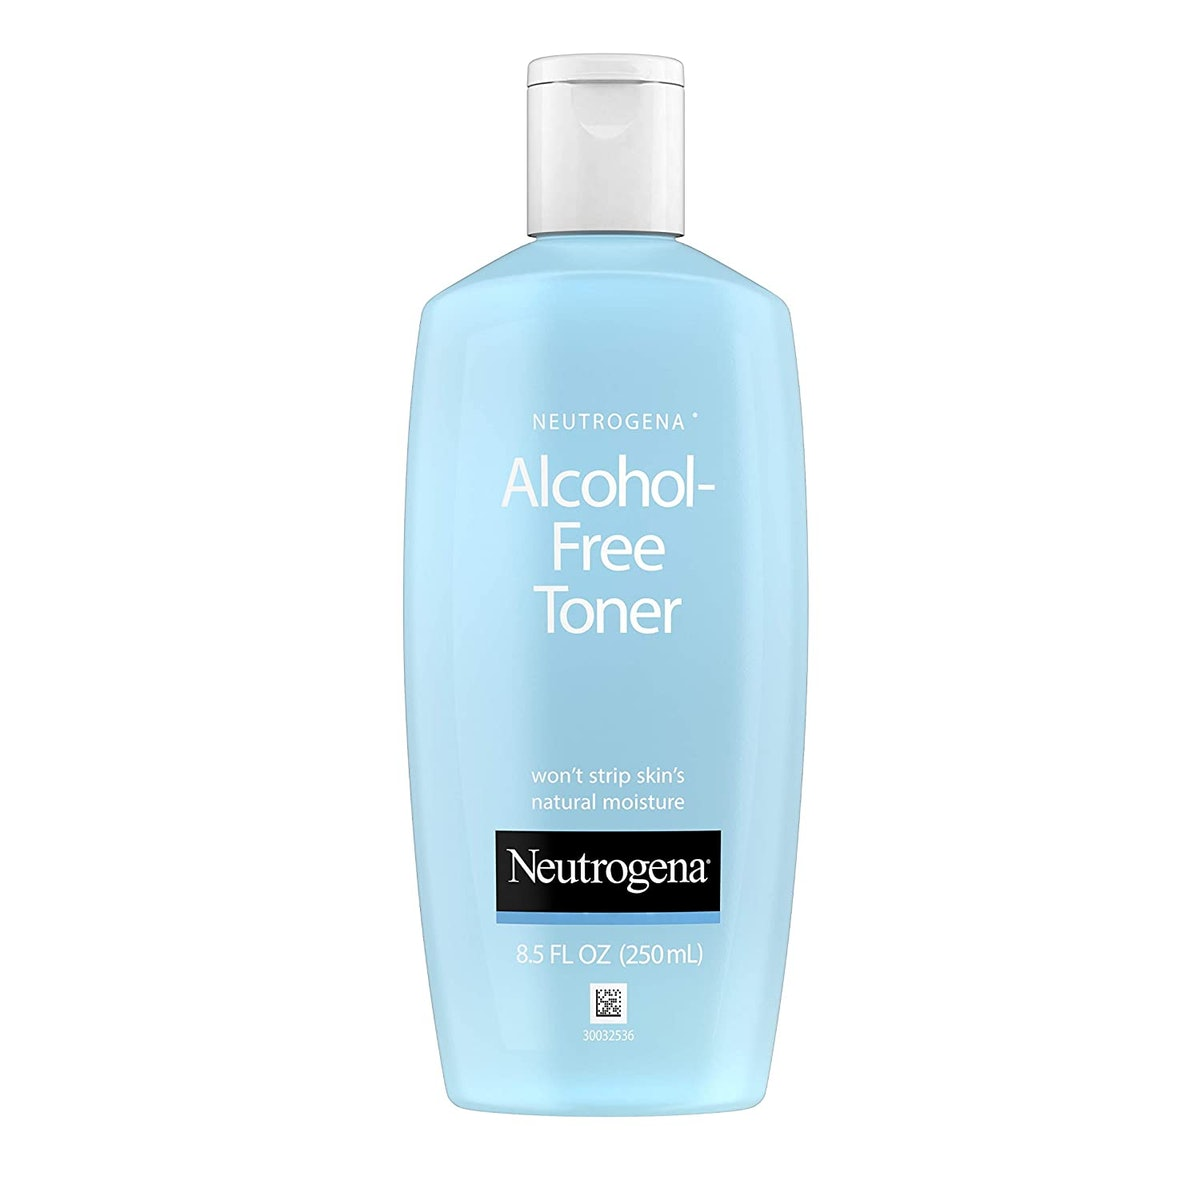 Neutrogena Alcohol-Free Toner-8.5oz